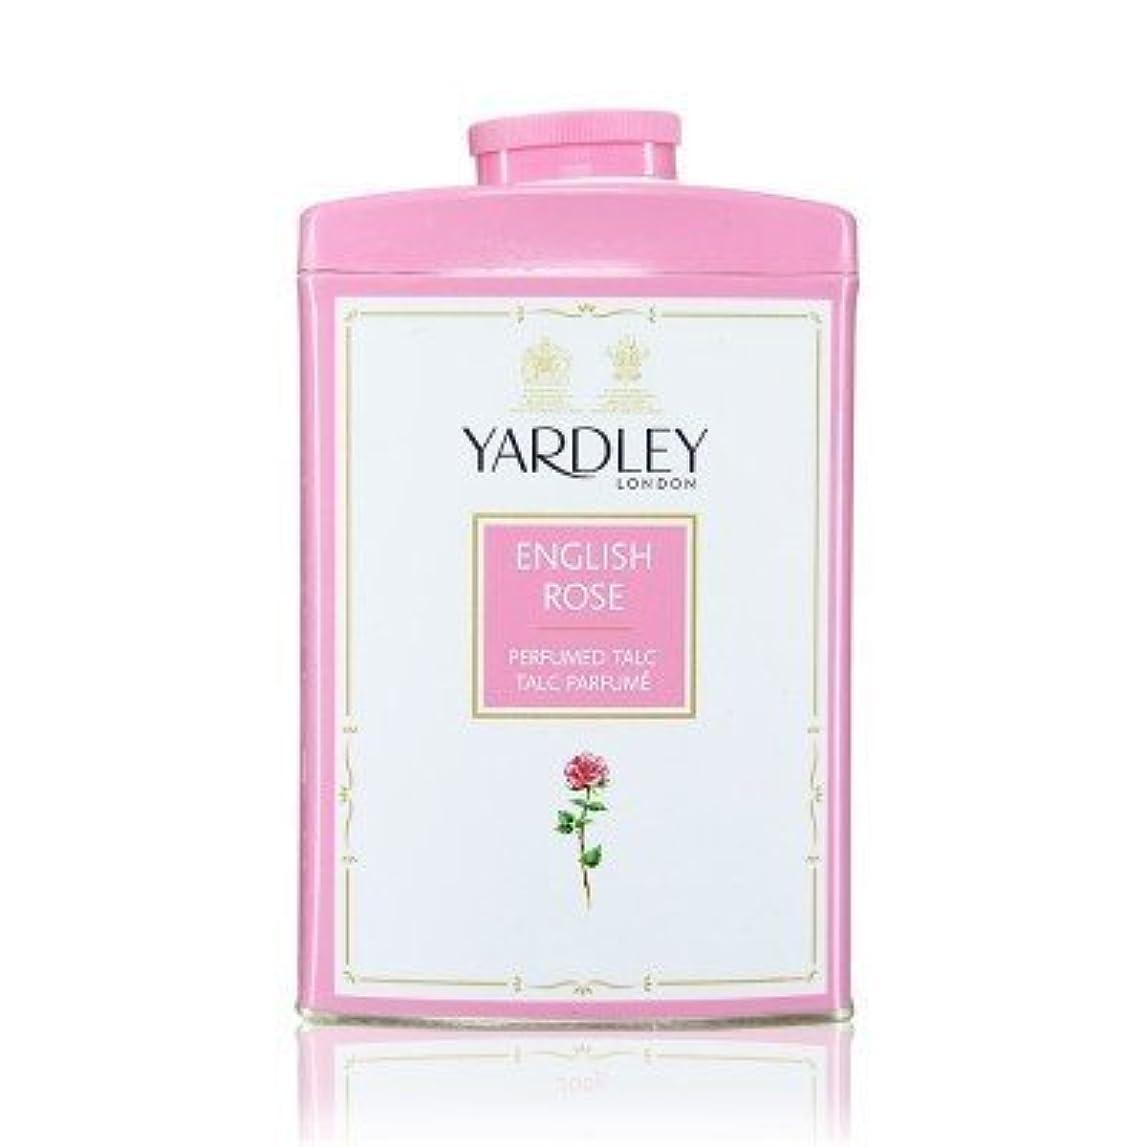 Yardley English Rose Perfumed Talc, 250 g by Yardley [並行輸入品]